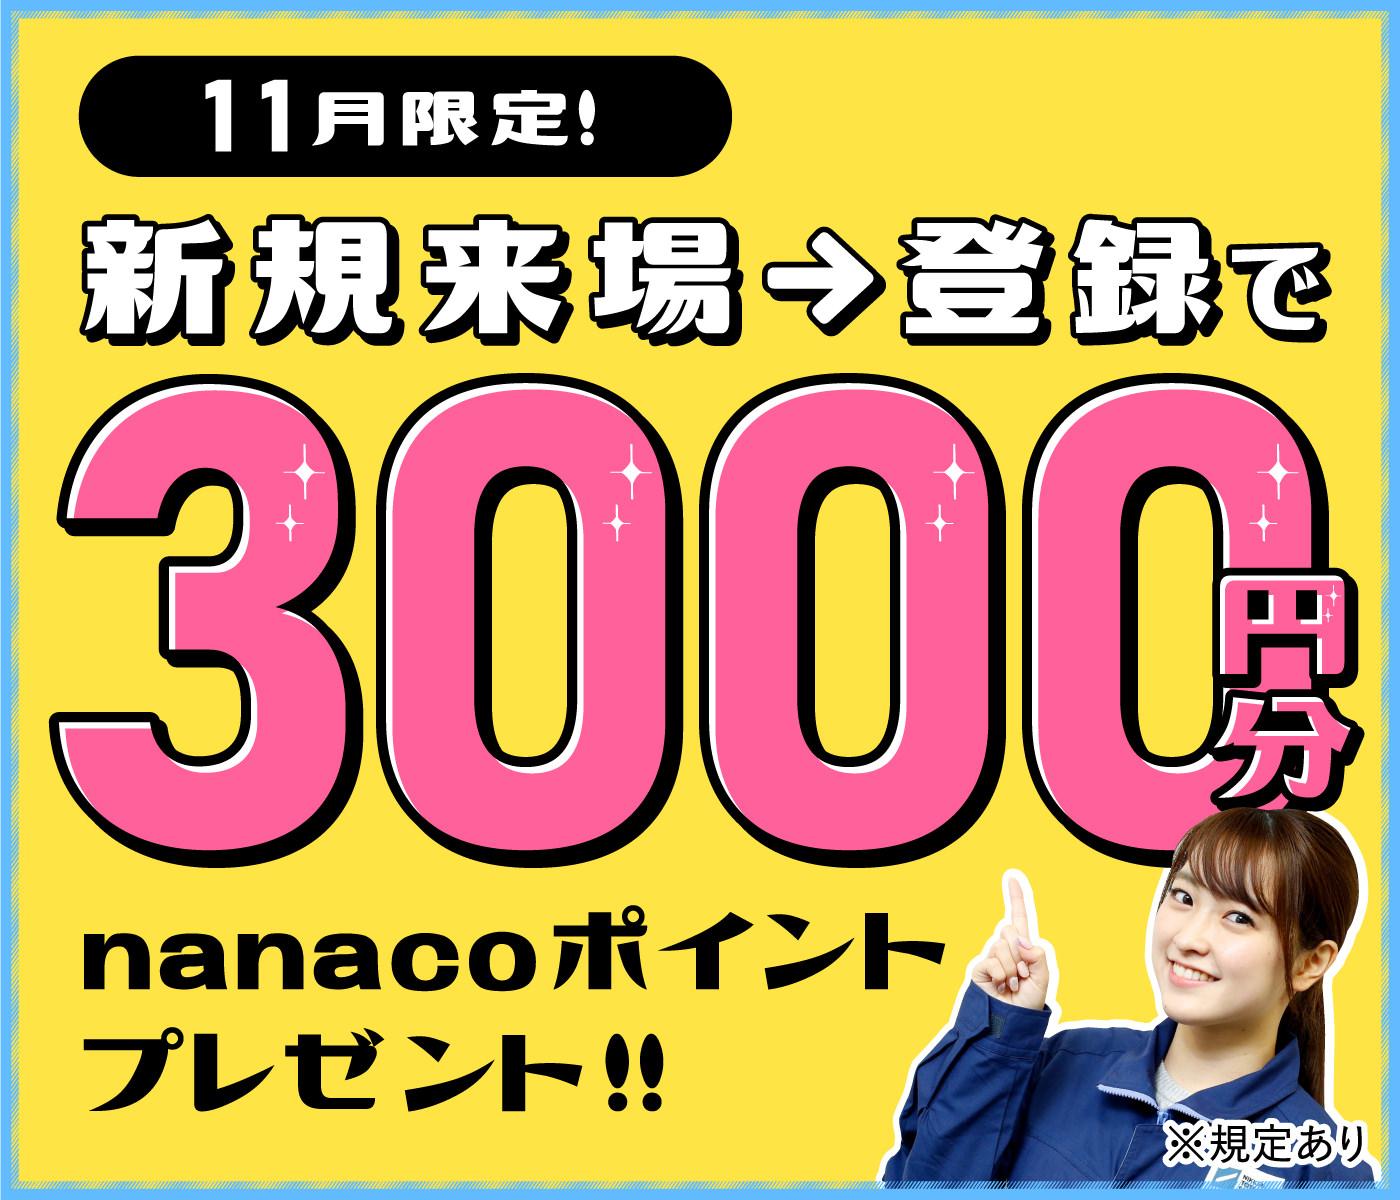 【中津市】週払い可◆入社特典20万円!寮費無料◆軽自動車の組立・検査